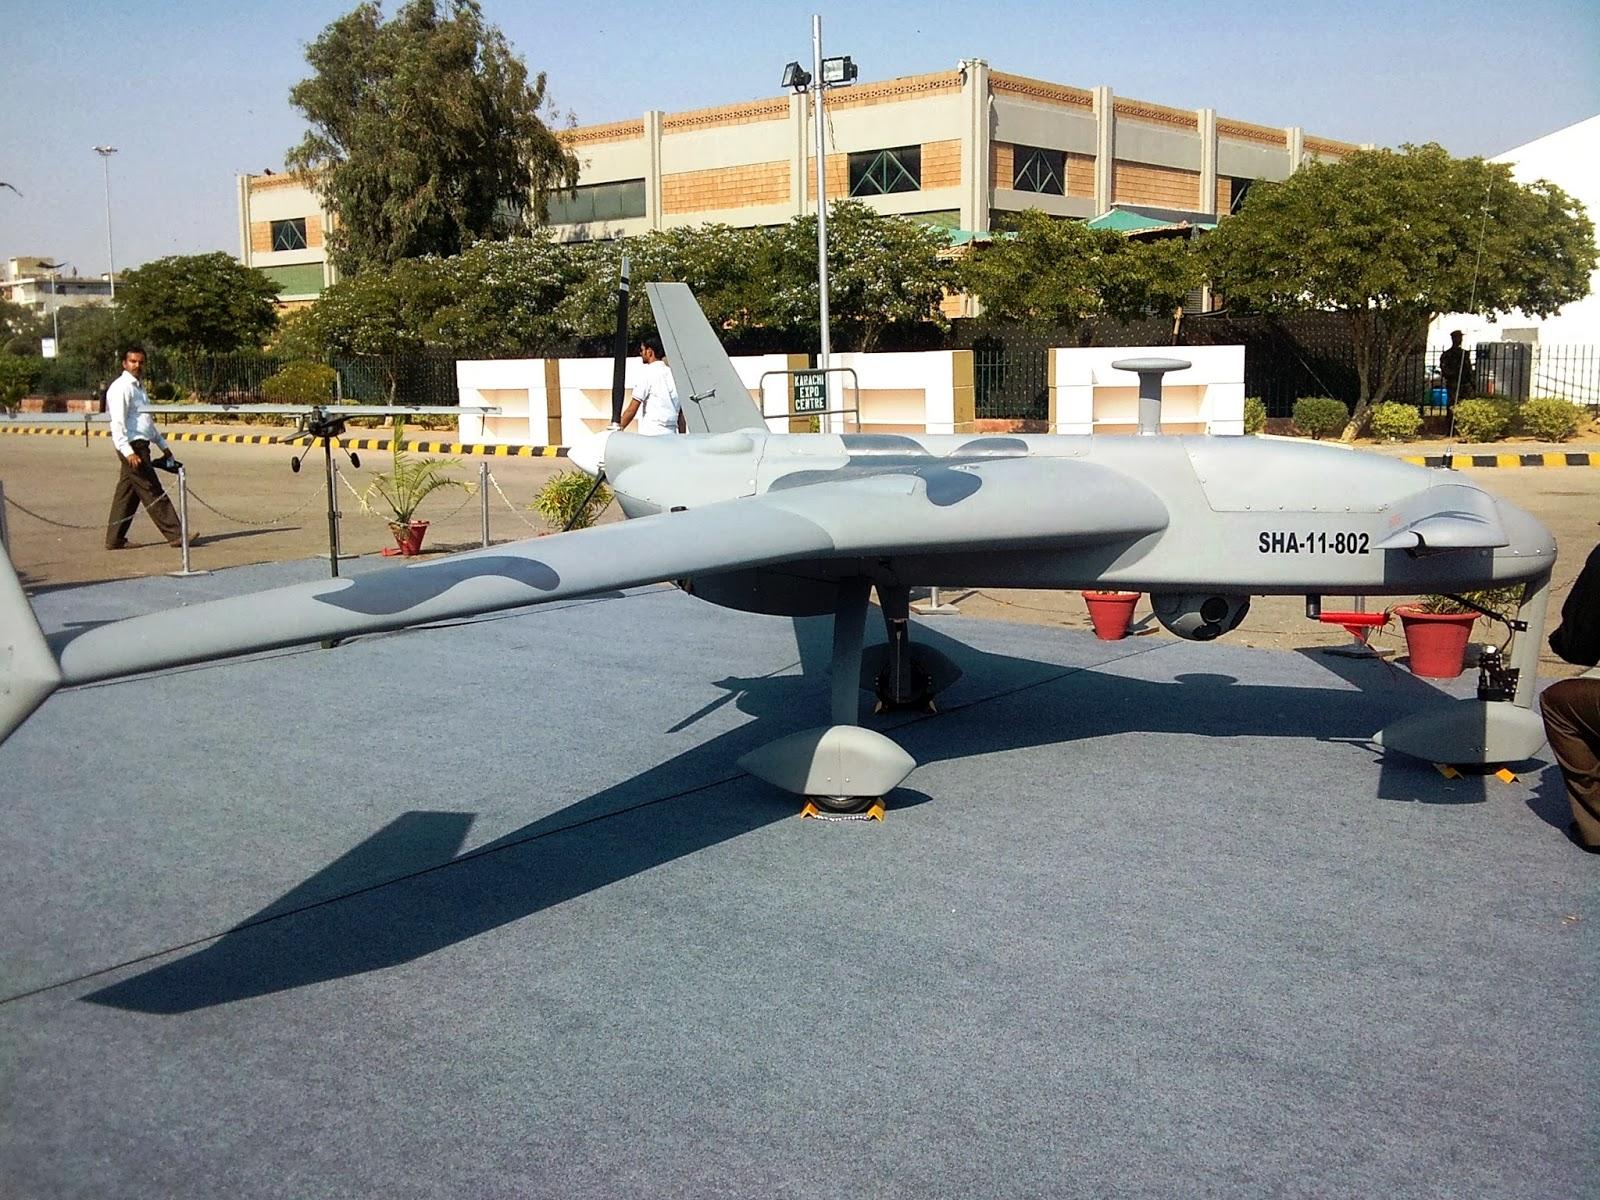 Shepherd-MIL Unmanned Aerial Vehicle (UAV)   Global ...  Unmanned Aircraft Vehicle